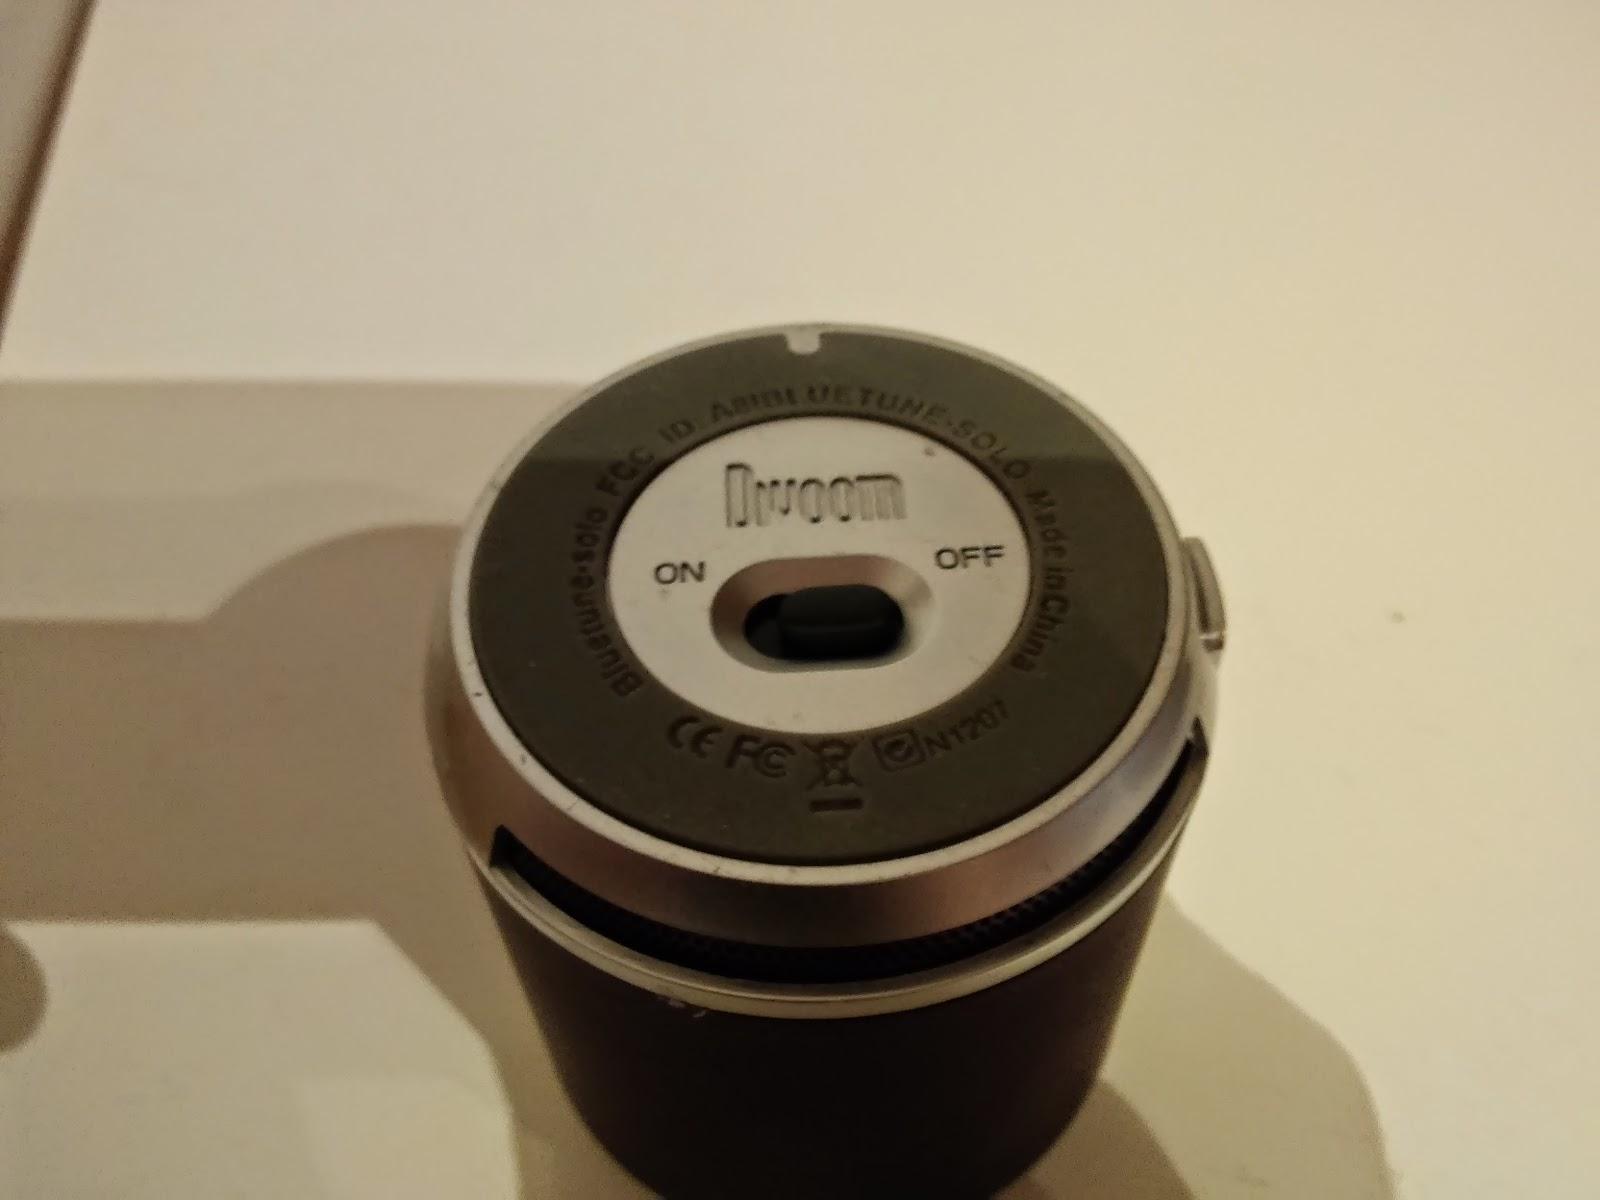 Divoom Bluetune-Solo v3 speaker controls